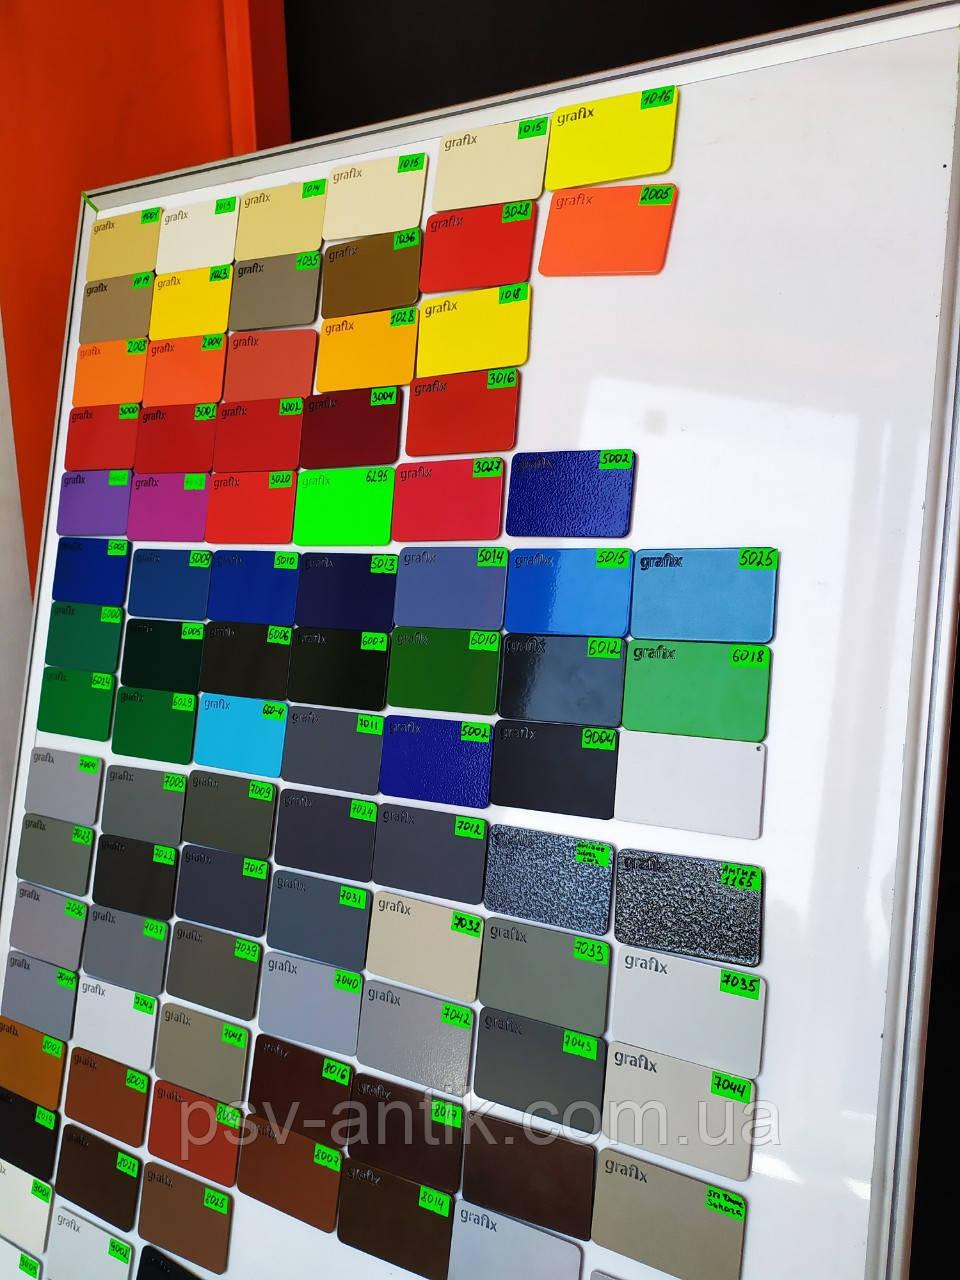 Порошковая краска глянцевая, полиэфирная, архитектурная, 2000